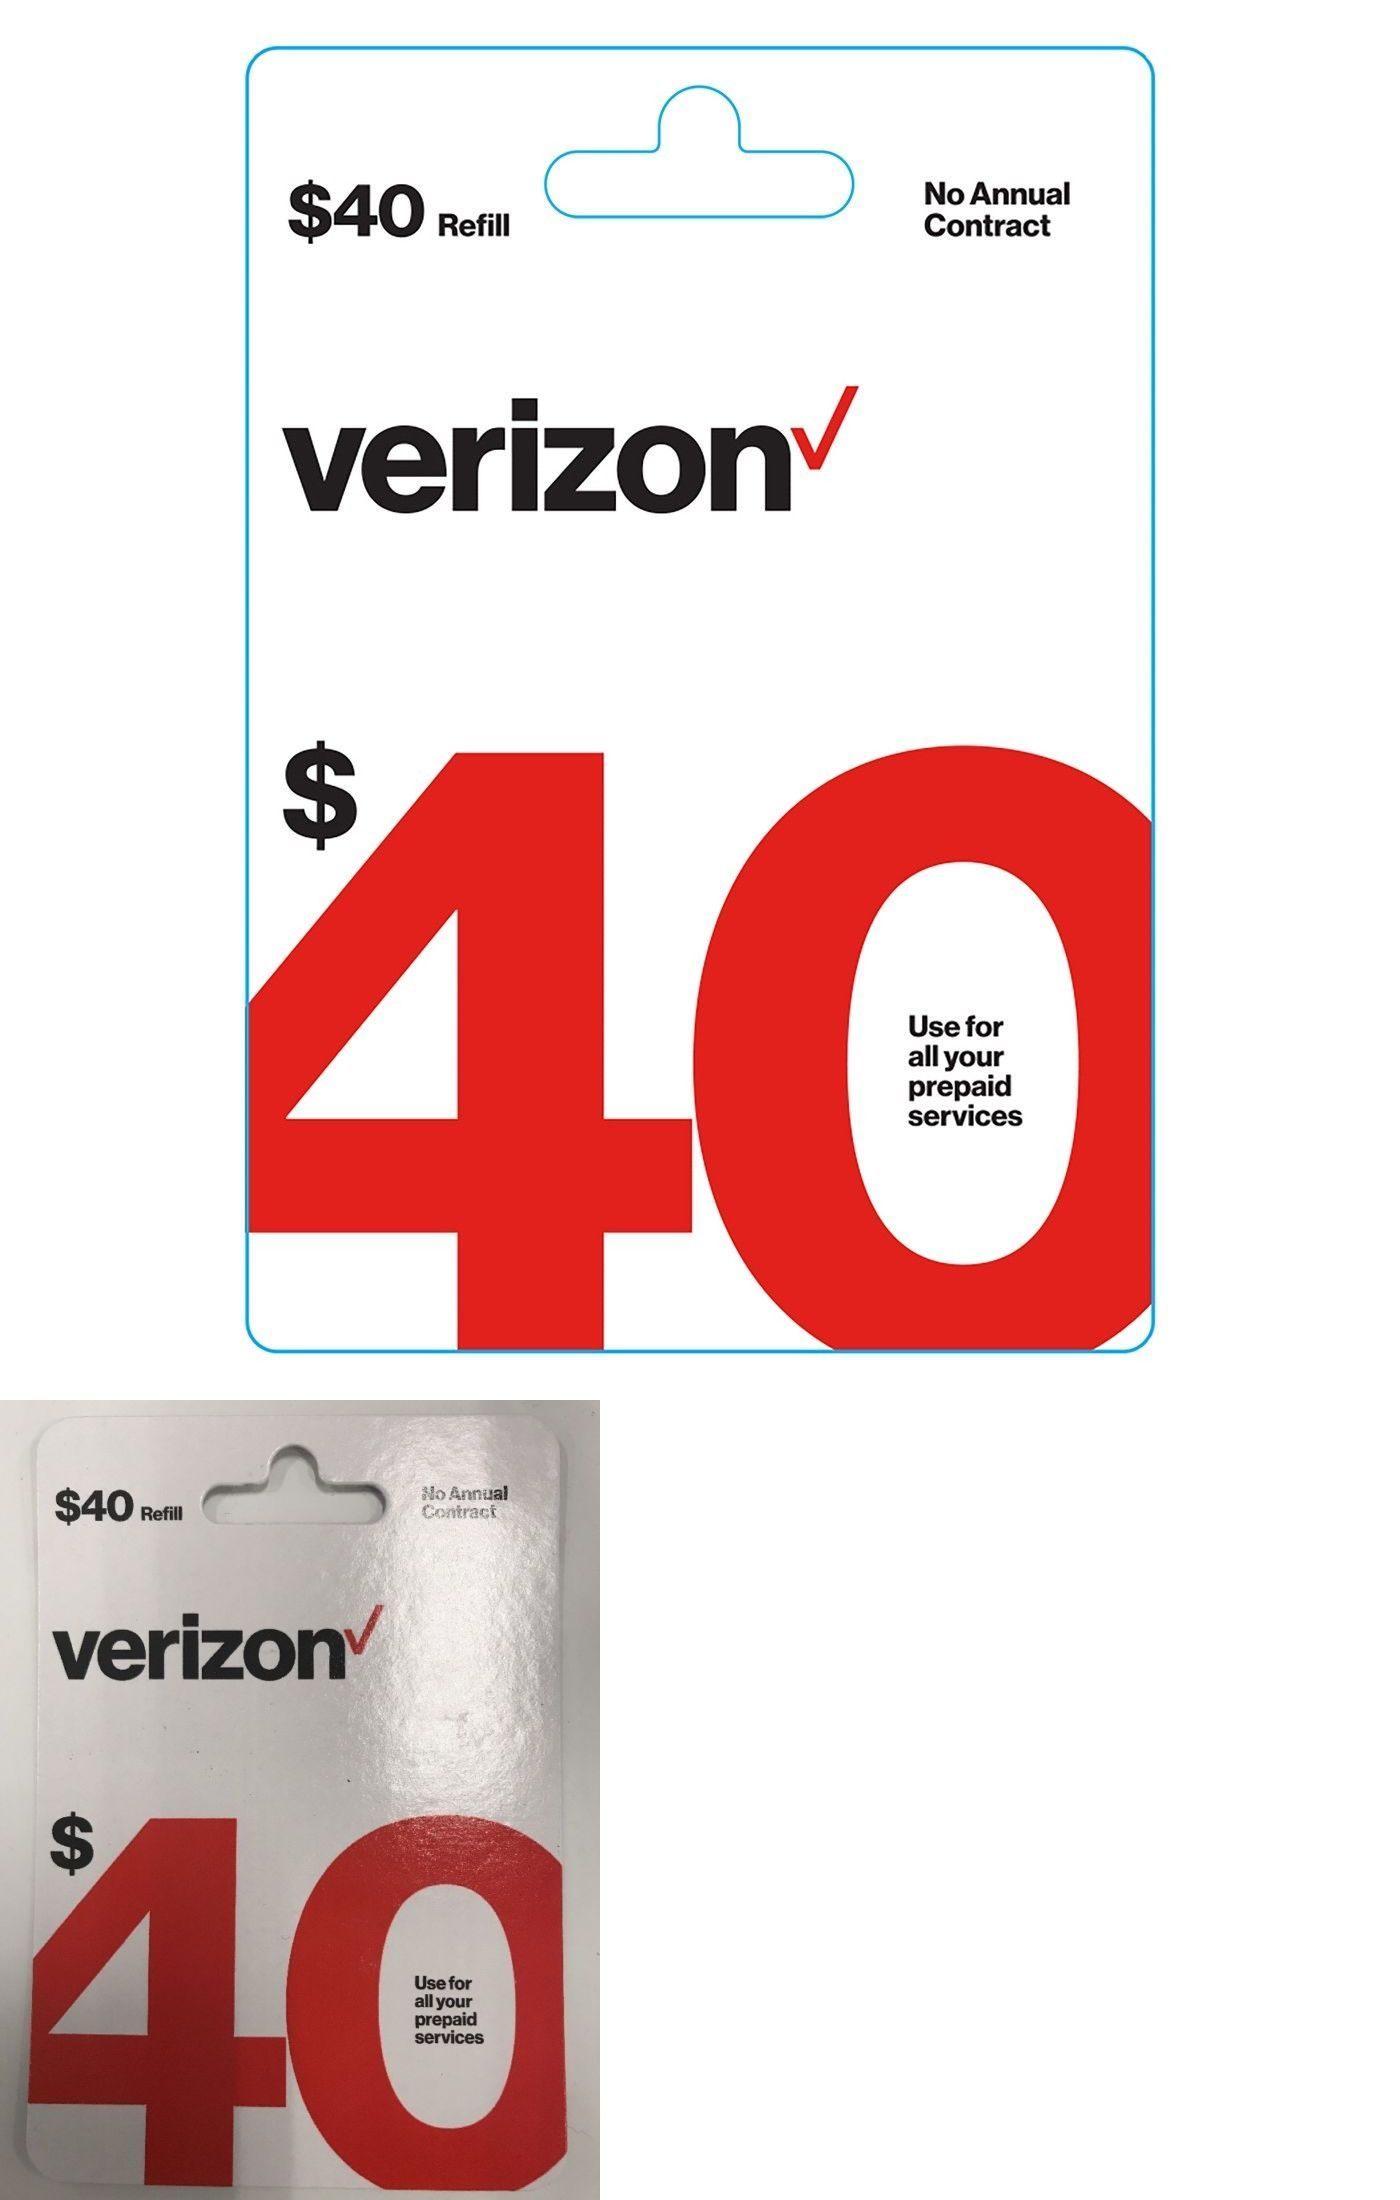 Phone and Data Cards 43308 Verizon Prepaid 40 Refill